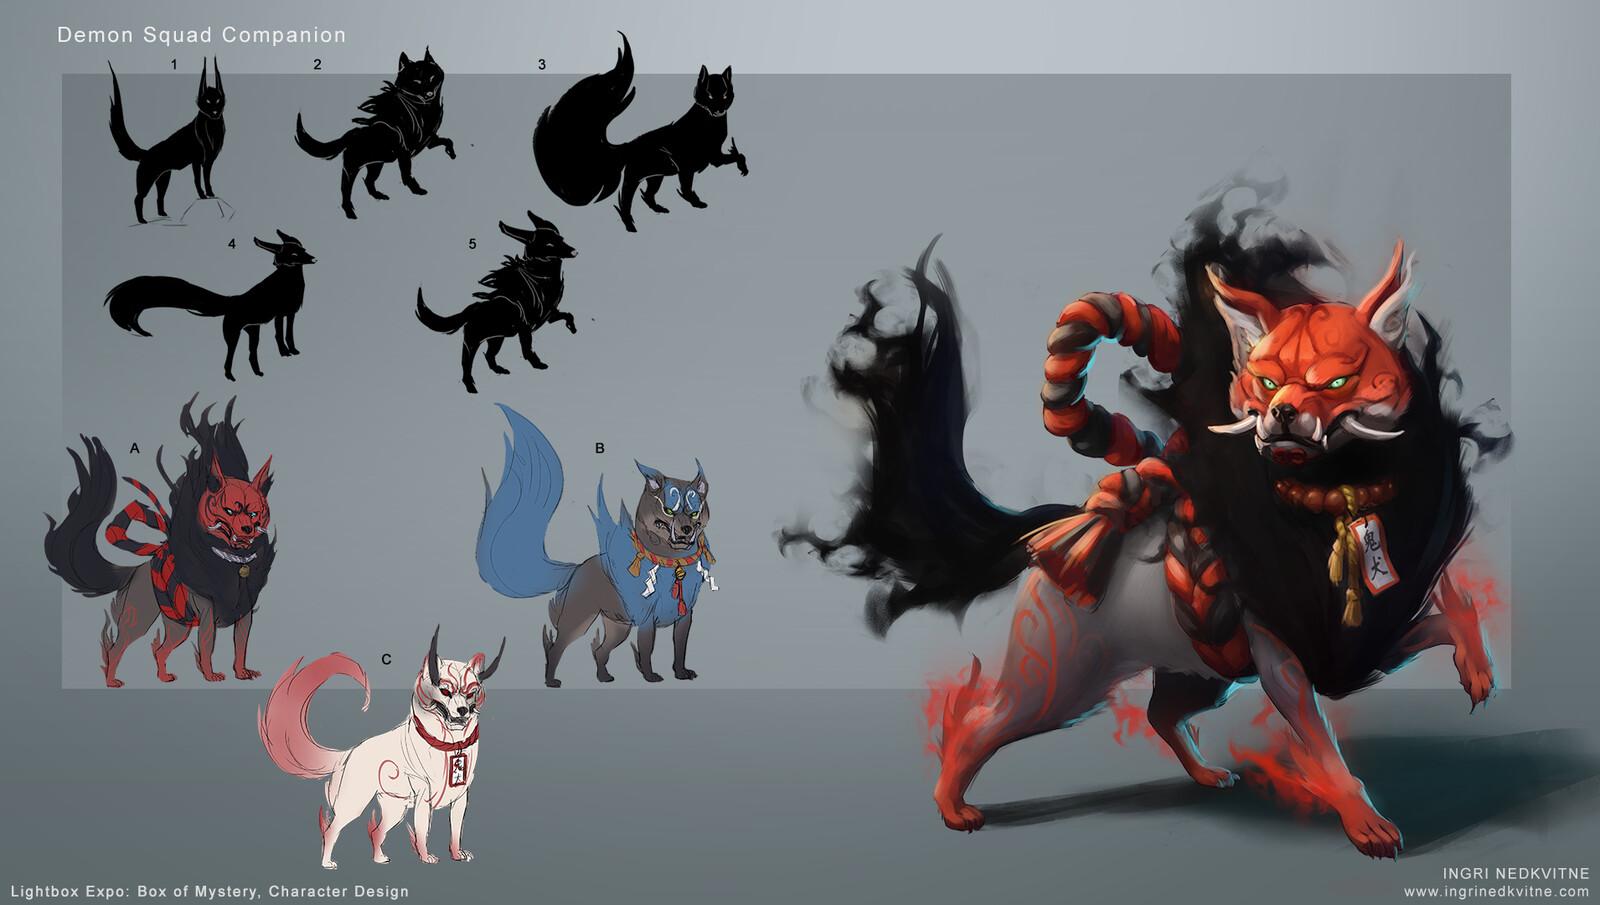 Iteration process for Demon Squad Companion